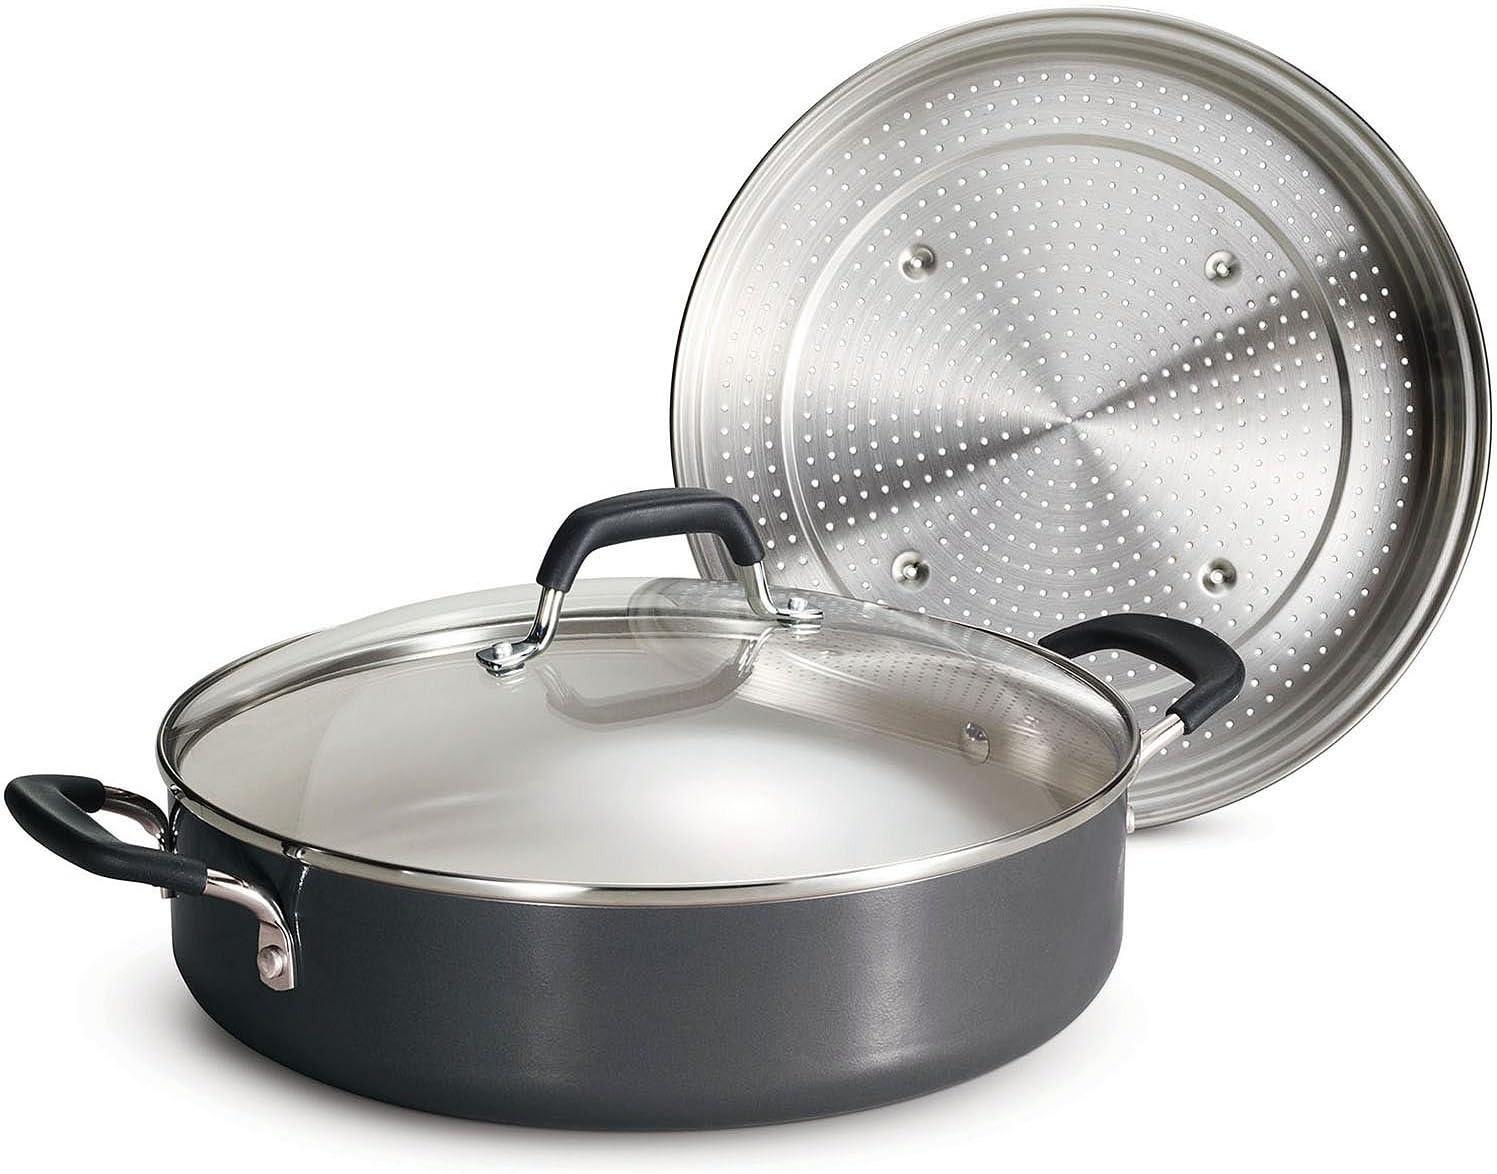 Tramontina Nonstick Everyday Pan, 5.5 qt. - Gray